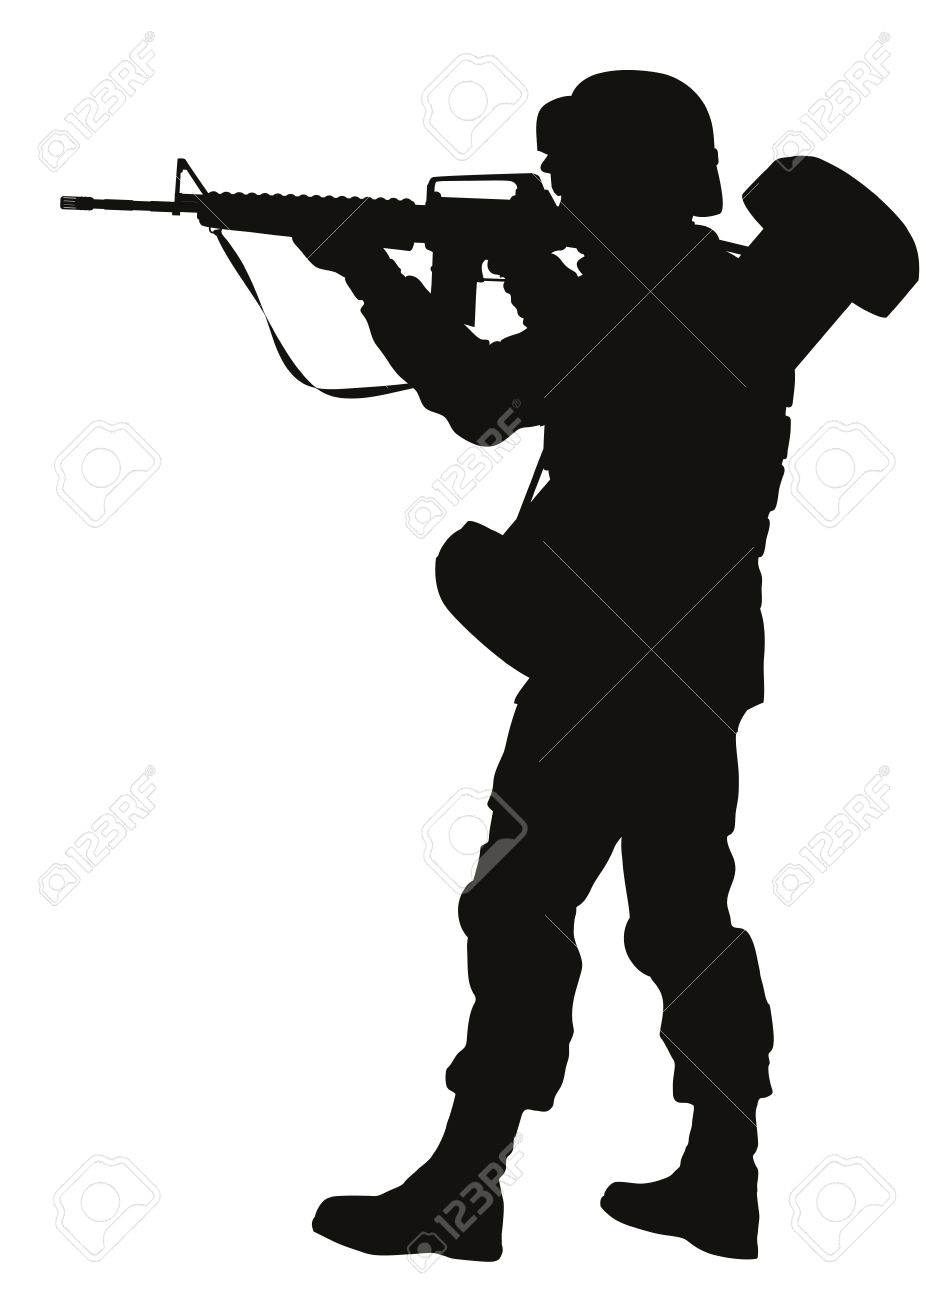 951x1300 Soldier Clipart Gun Silhouette